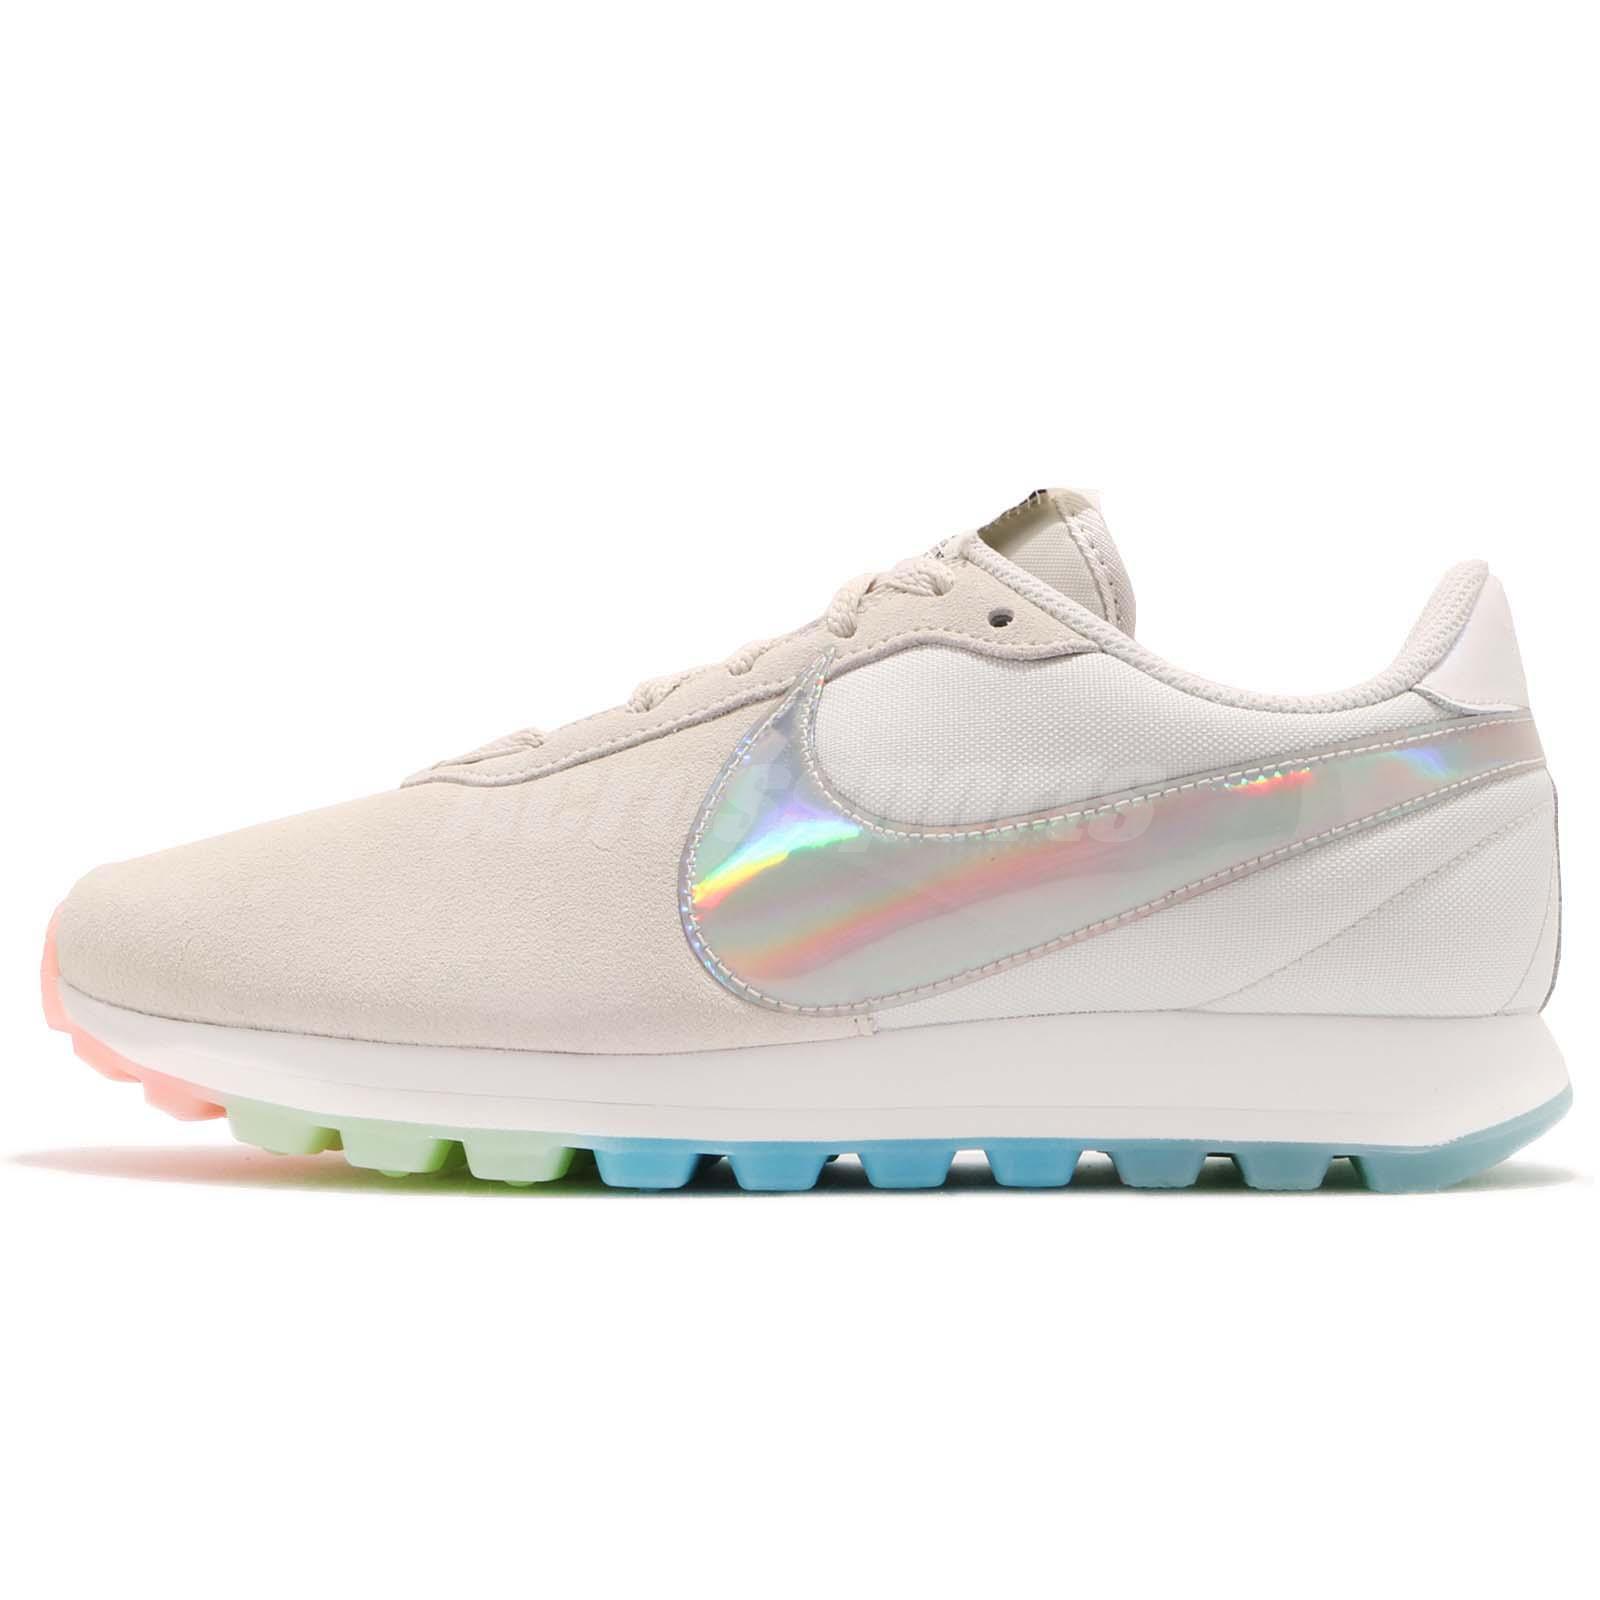 79cef95e9fe446 Nike Wmns Nike Pre-Love O.X. Rainbow Iridescent Summit White Women  AO3166-100